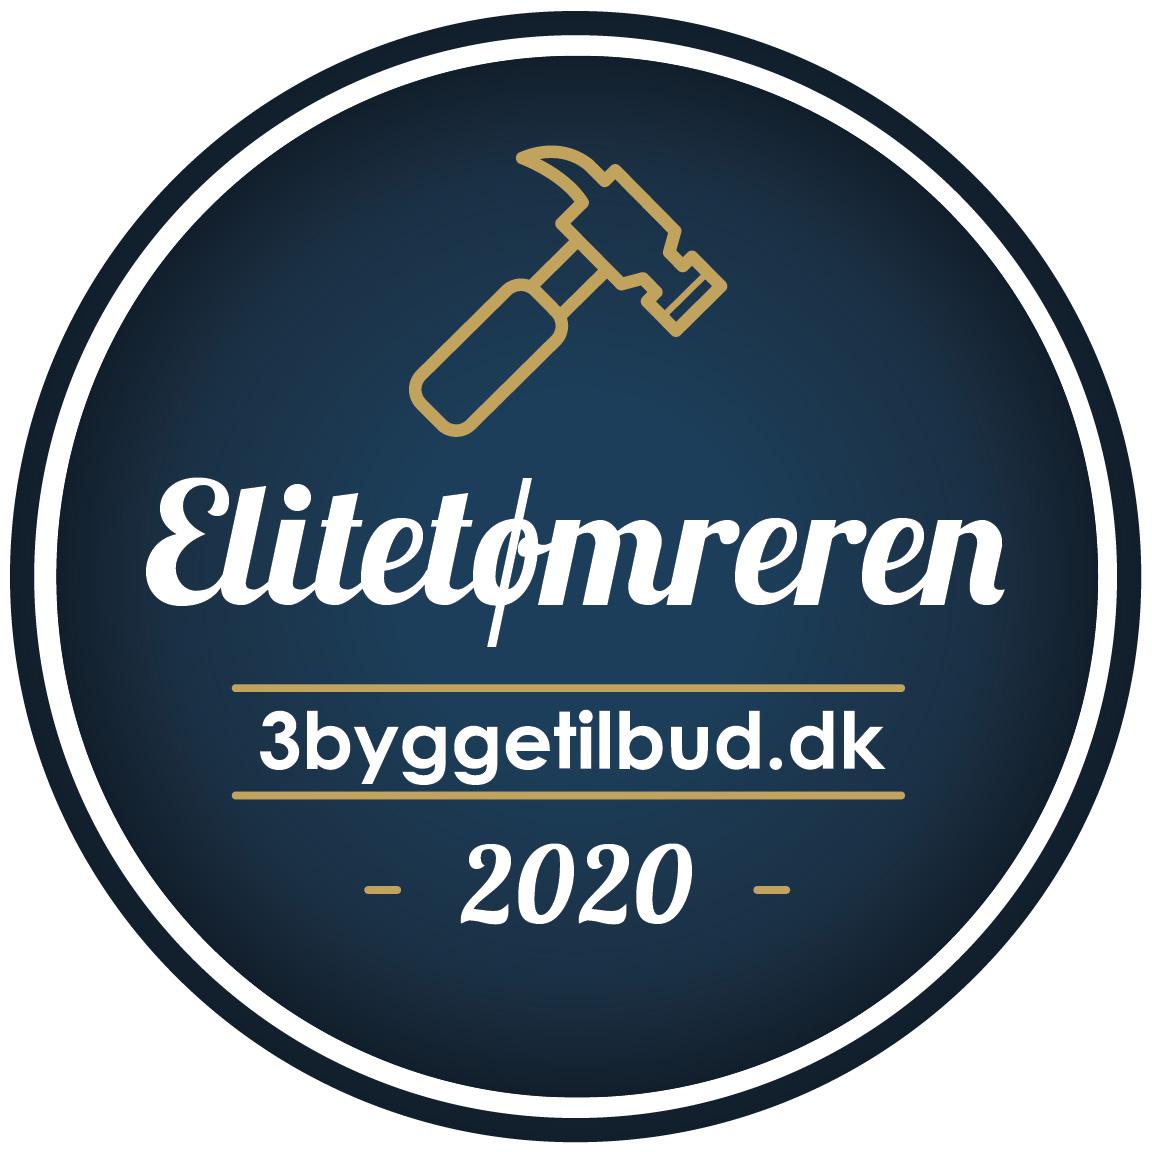 Elite tømren 2020